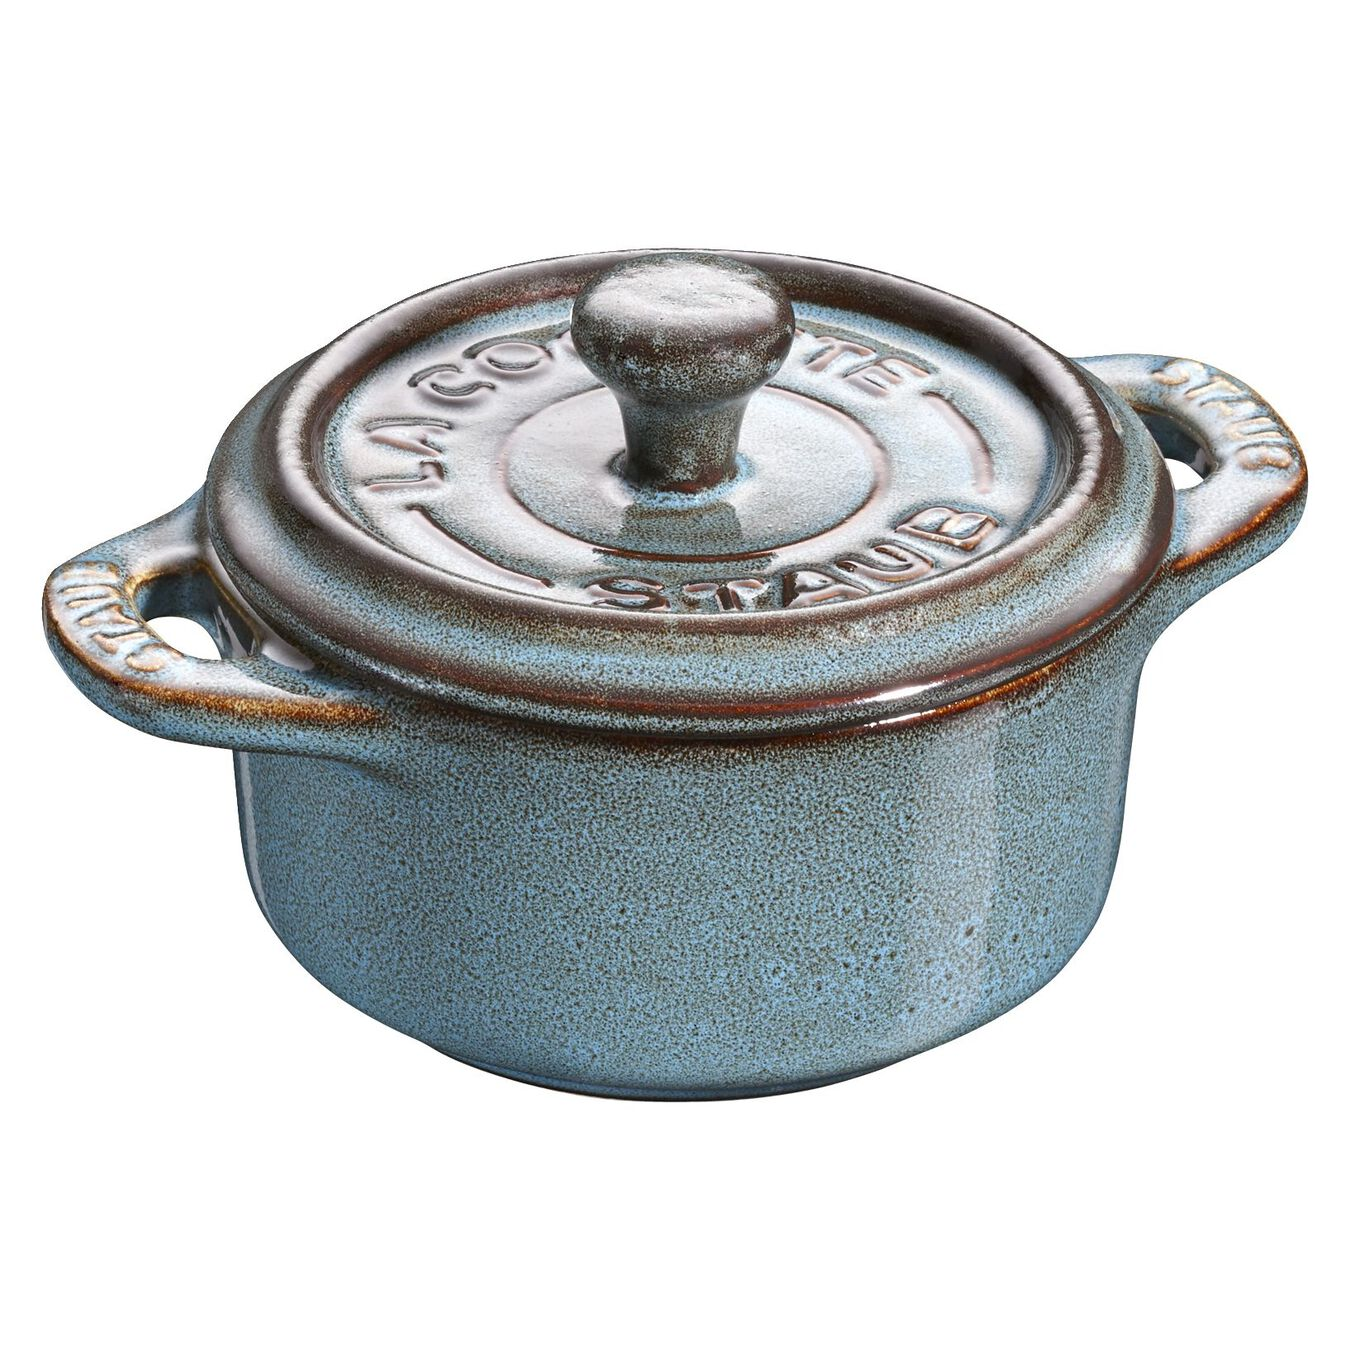 Mini Cocotte 10 cm, rund, Antik-Türkis, Keramik,,large 1